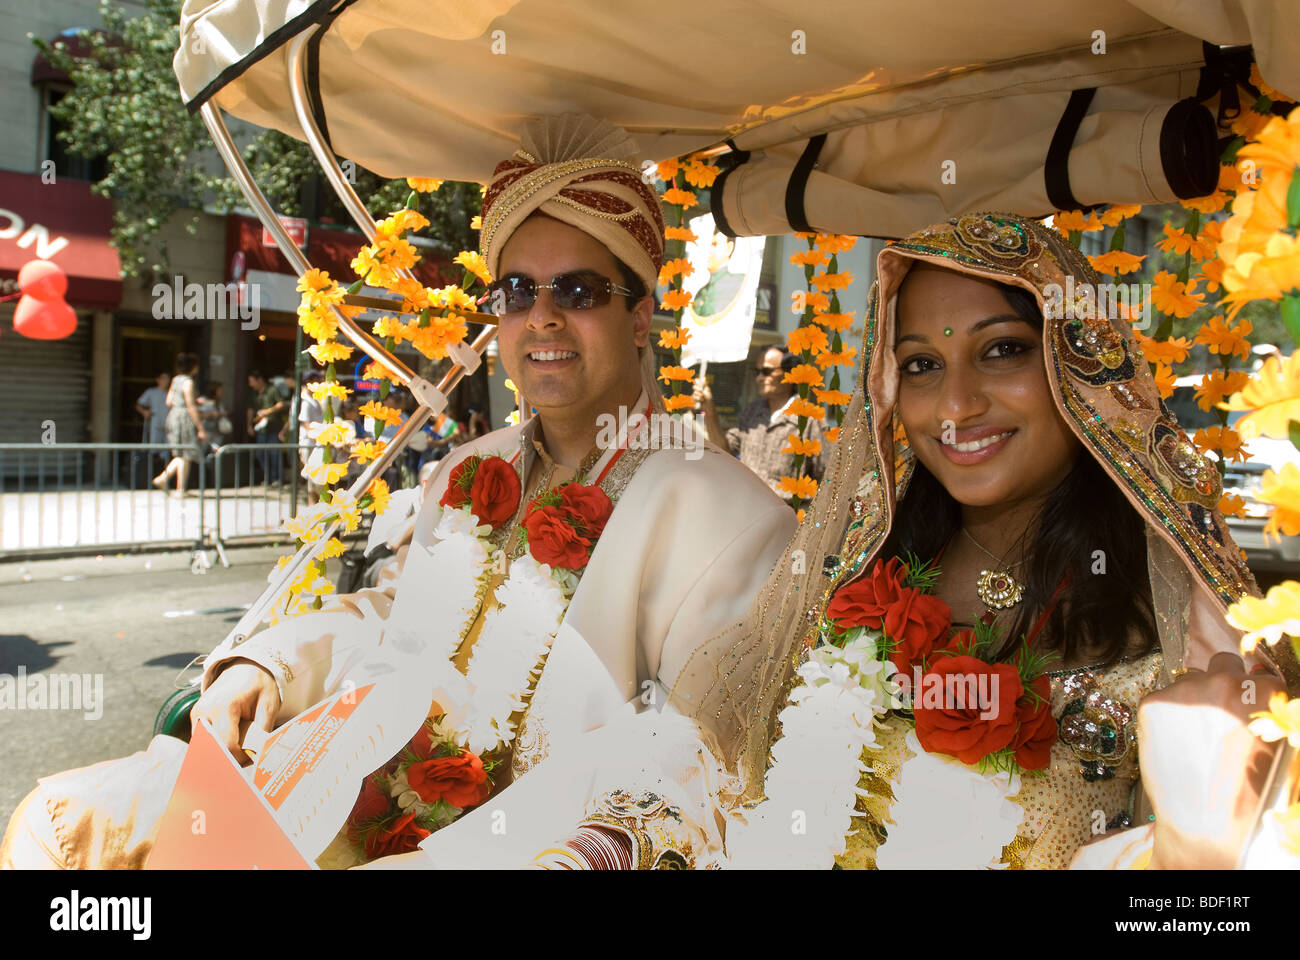 Un gruppo promuovendo la Bharat matrimonio dating service in Indian Independence Day Parade di New York Immagini Stock